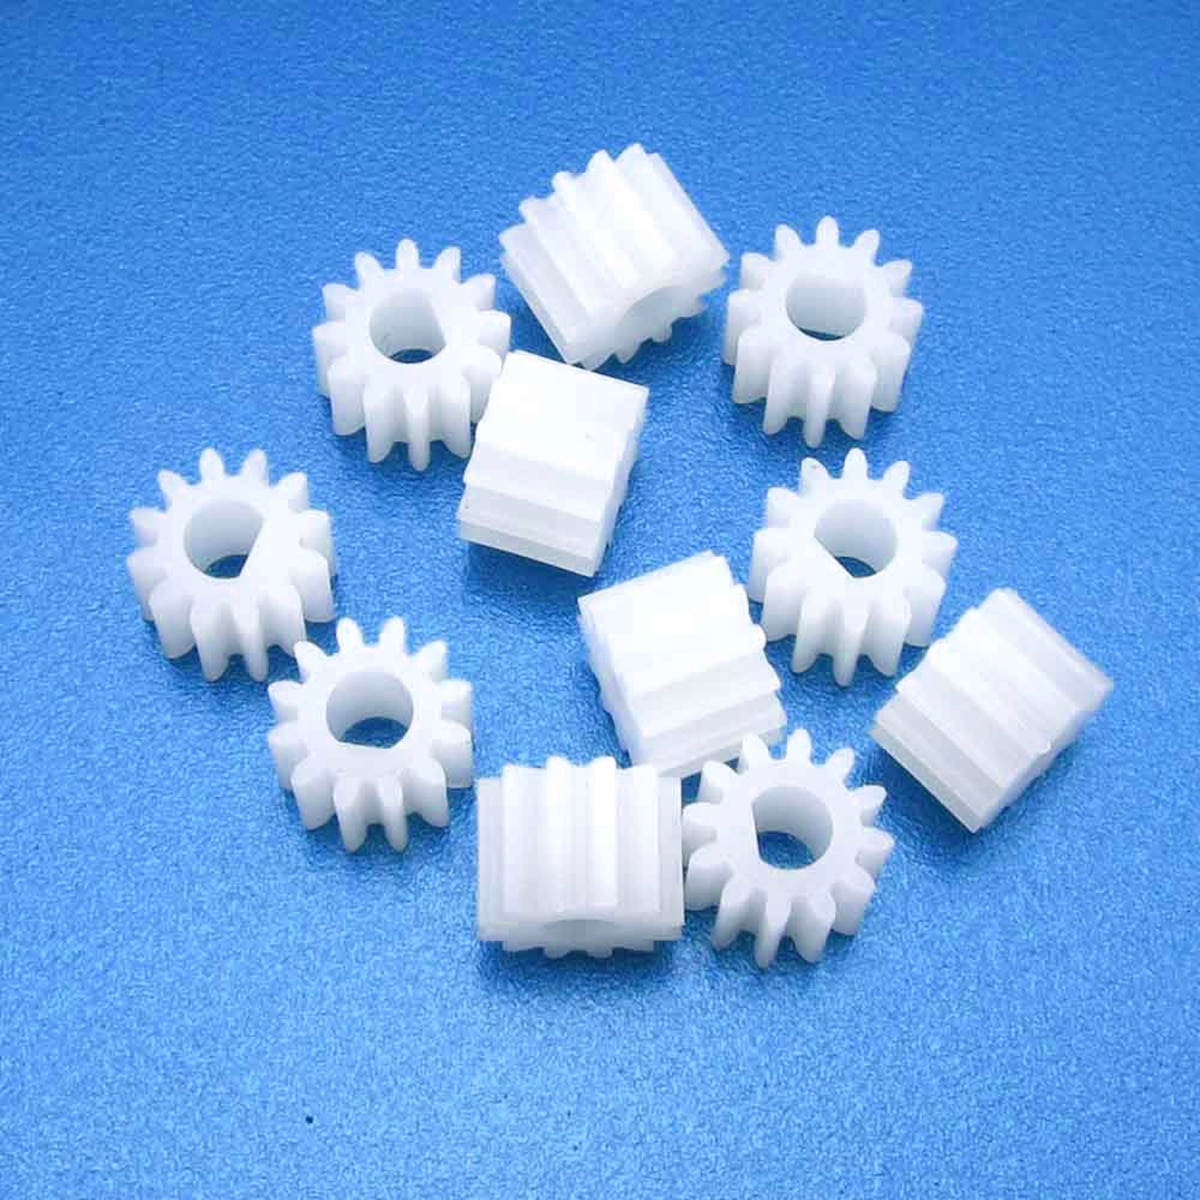 10pcs New D Shape Hole 3mm 12T M0.5 Gear 1012DF 12 Teeth Plastic Gear  For N20 D-Axis Motor DIY Mayitr